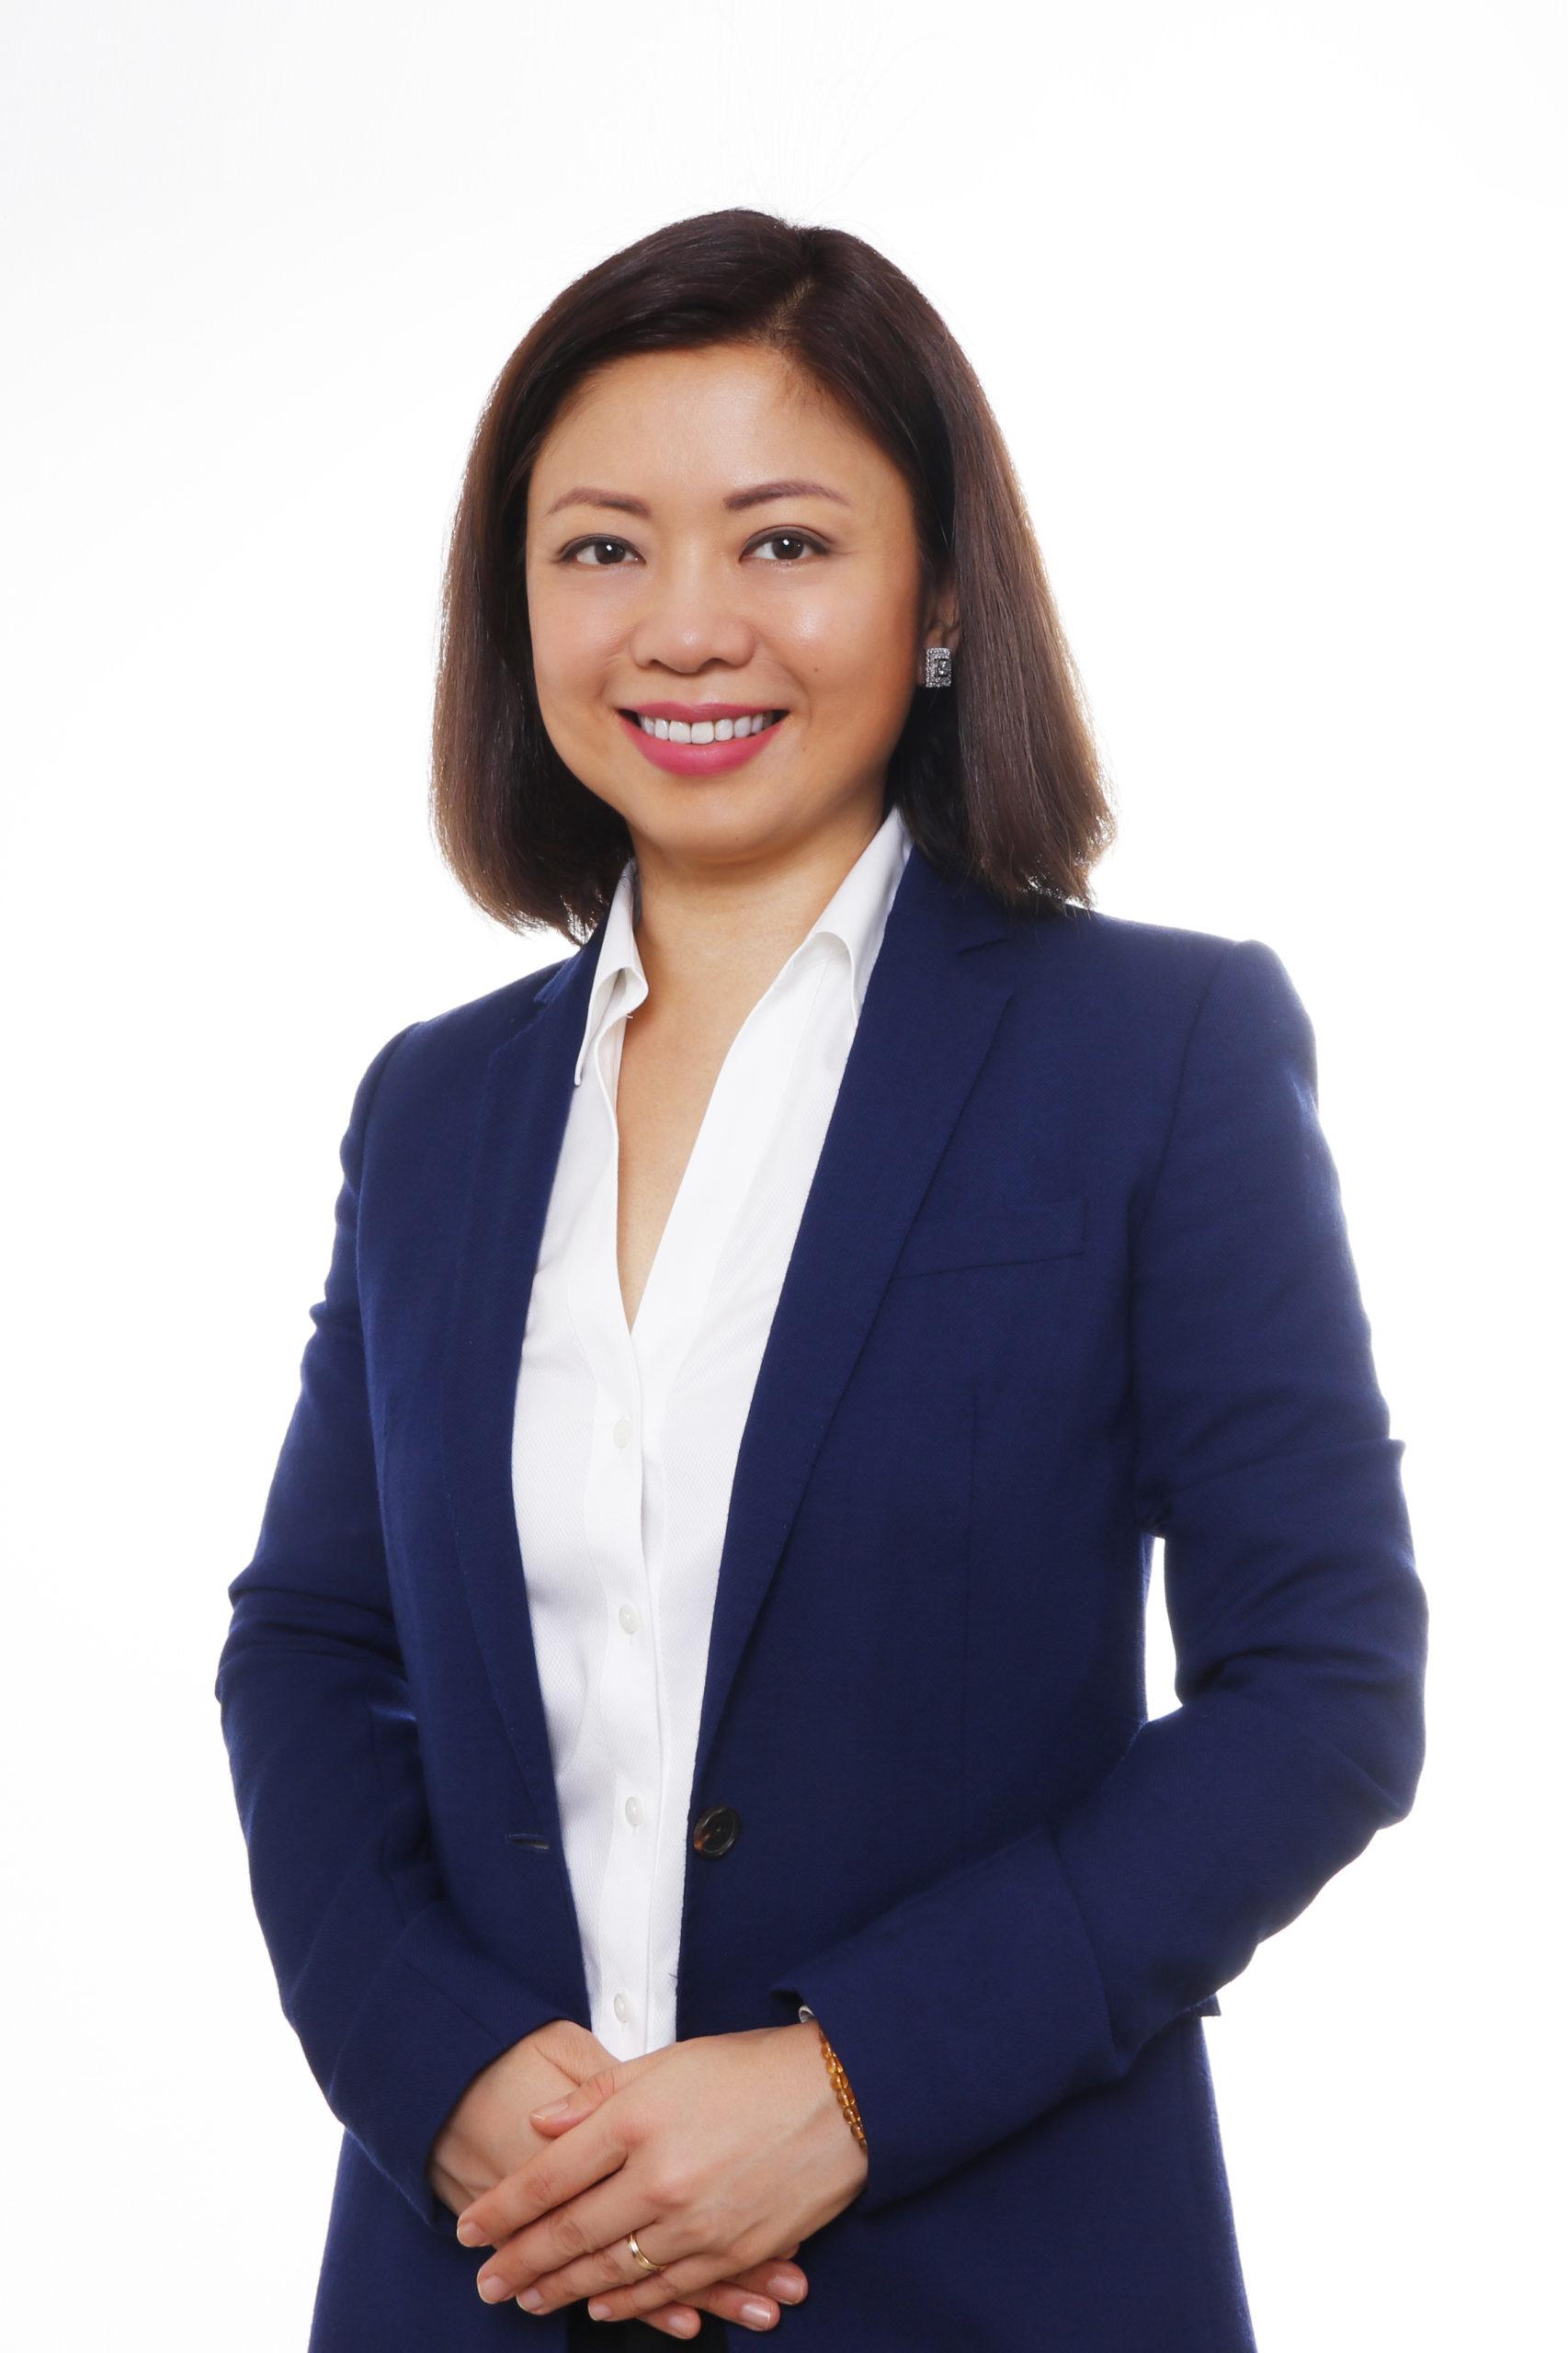 NTT LTD. Philippines announces Ireen Catane as new CEO